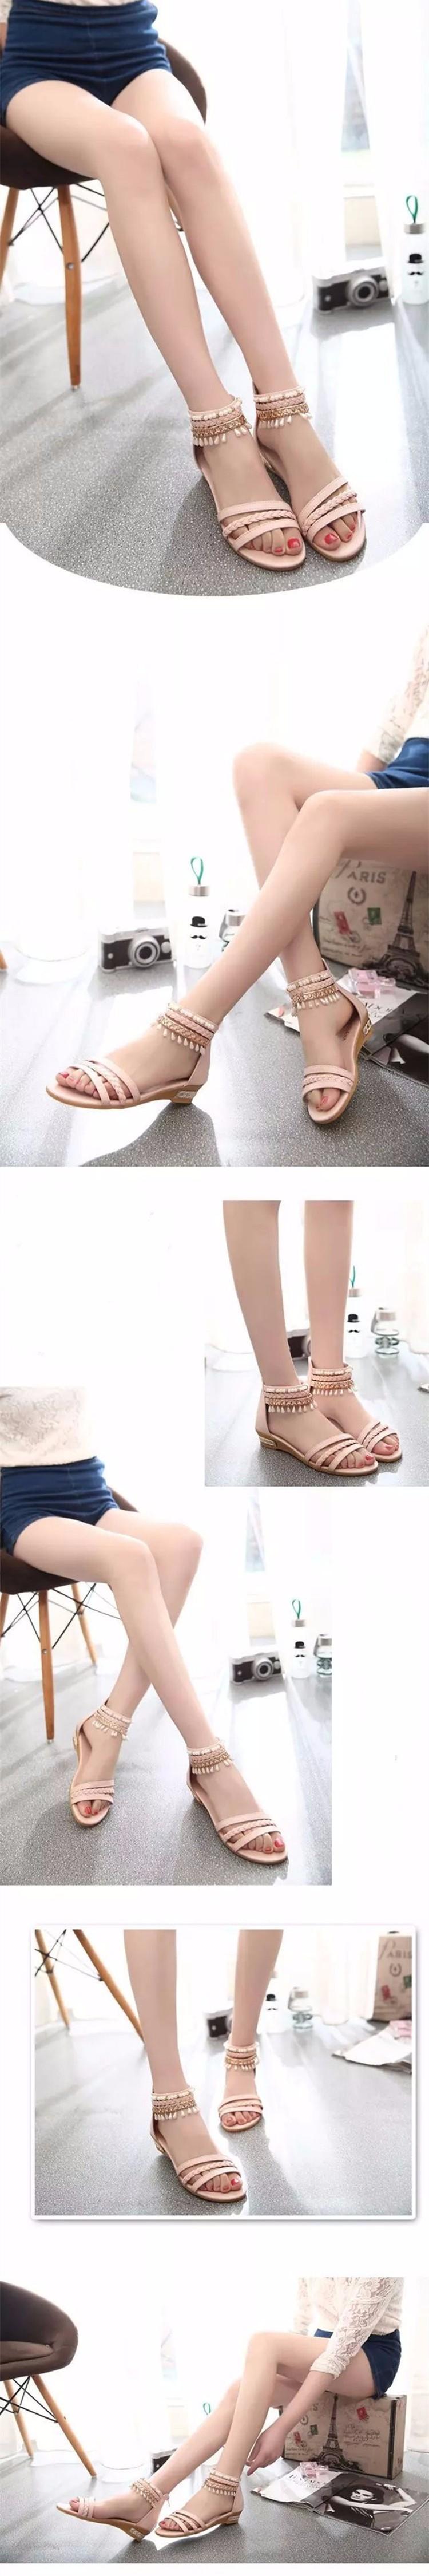 Hot Sale 2016 Summer Sweet Fashion Roman Beads Woman Sandals Leisure Peep Toe Wedges Shoes Wild Comfortable Ladies Sandals DT141 (6)